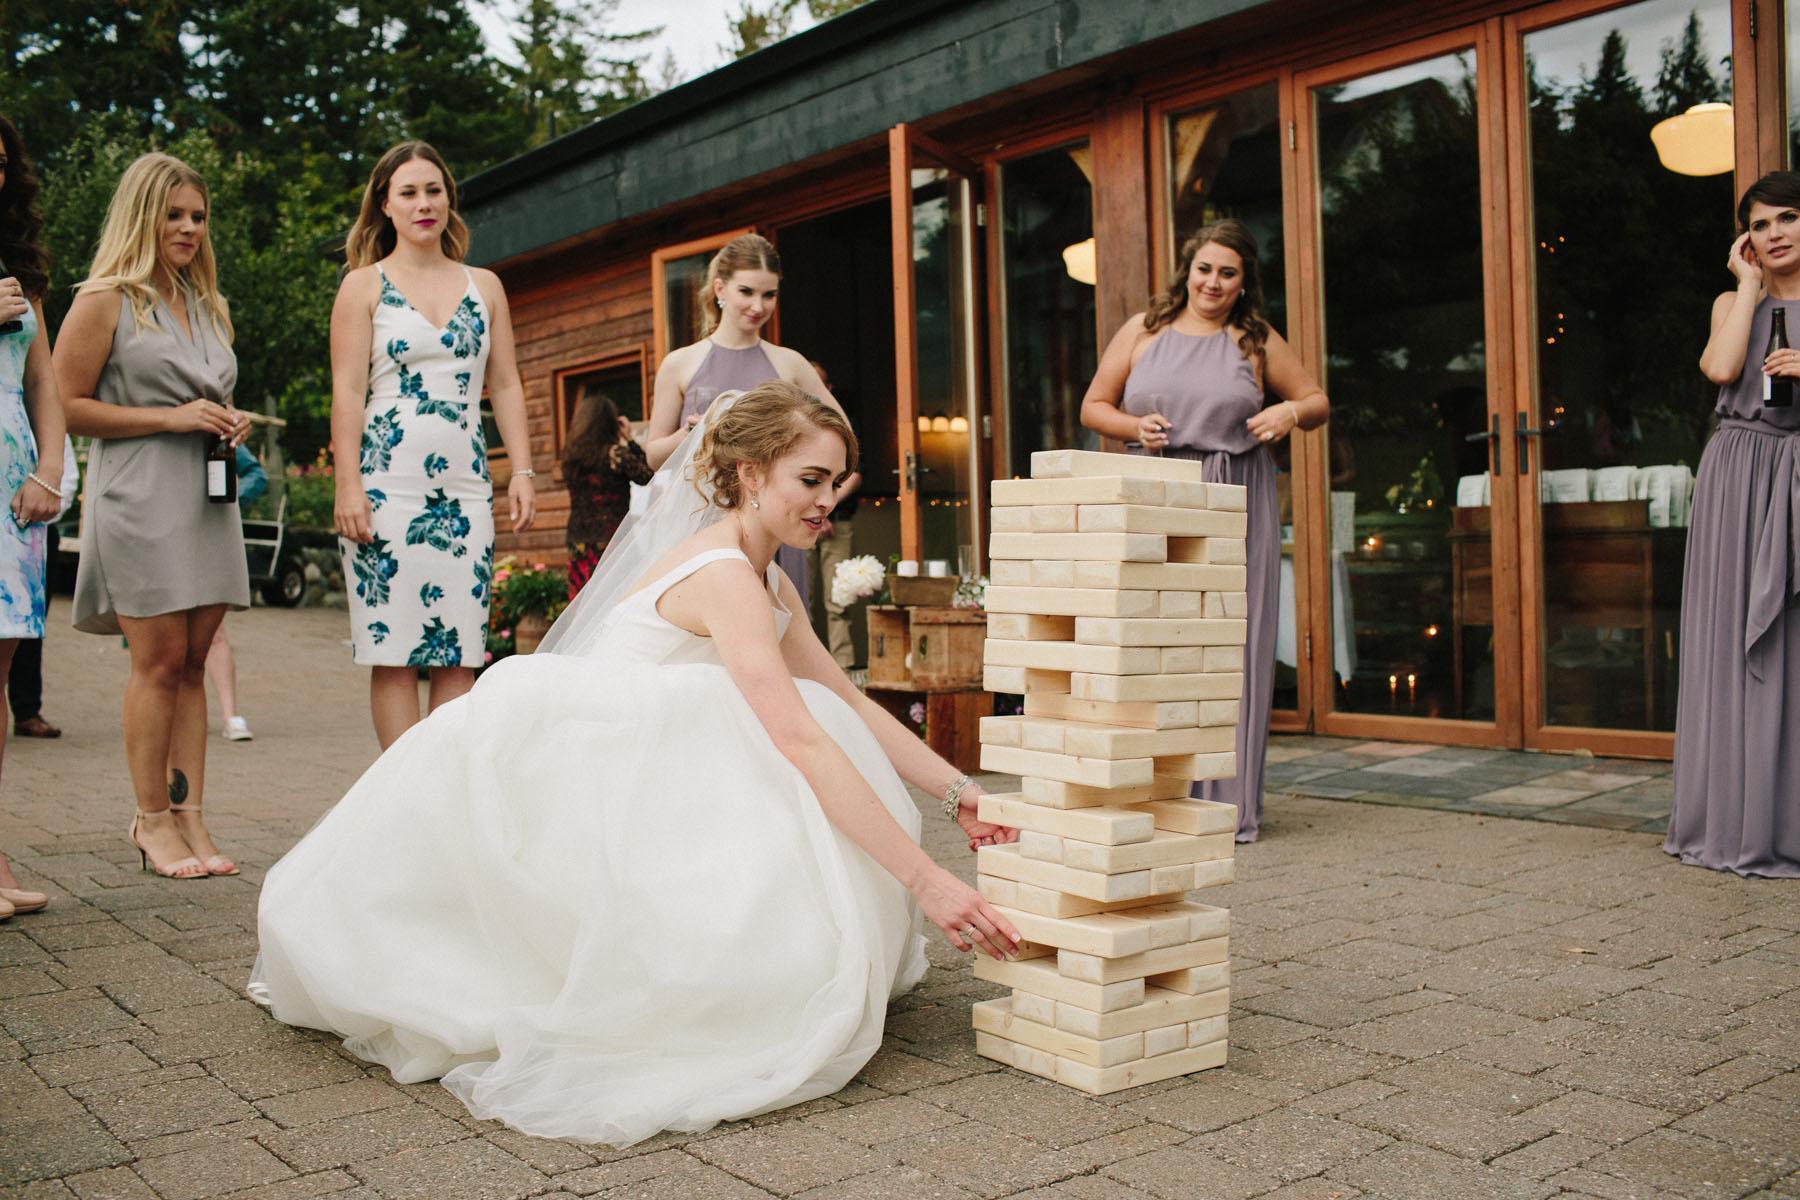 thetis-island-wedding-photographer-rp-rn-130.jpg